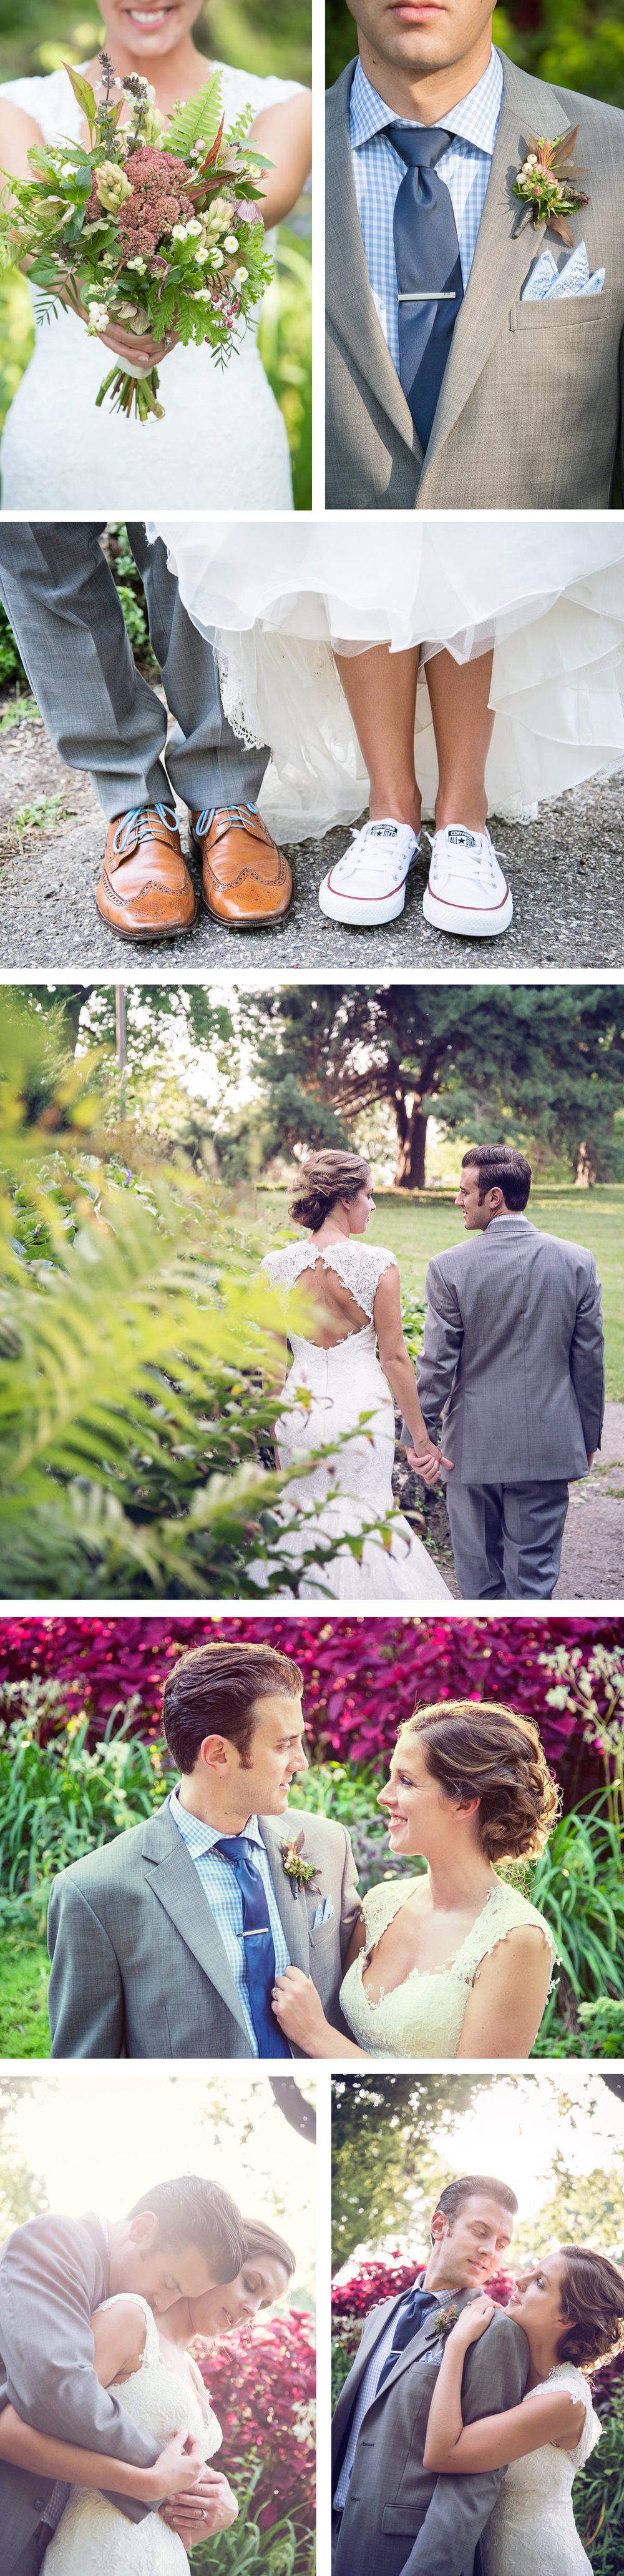 Mike_Danielle-bridegroom3.jpg